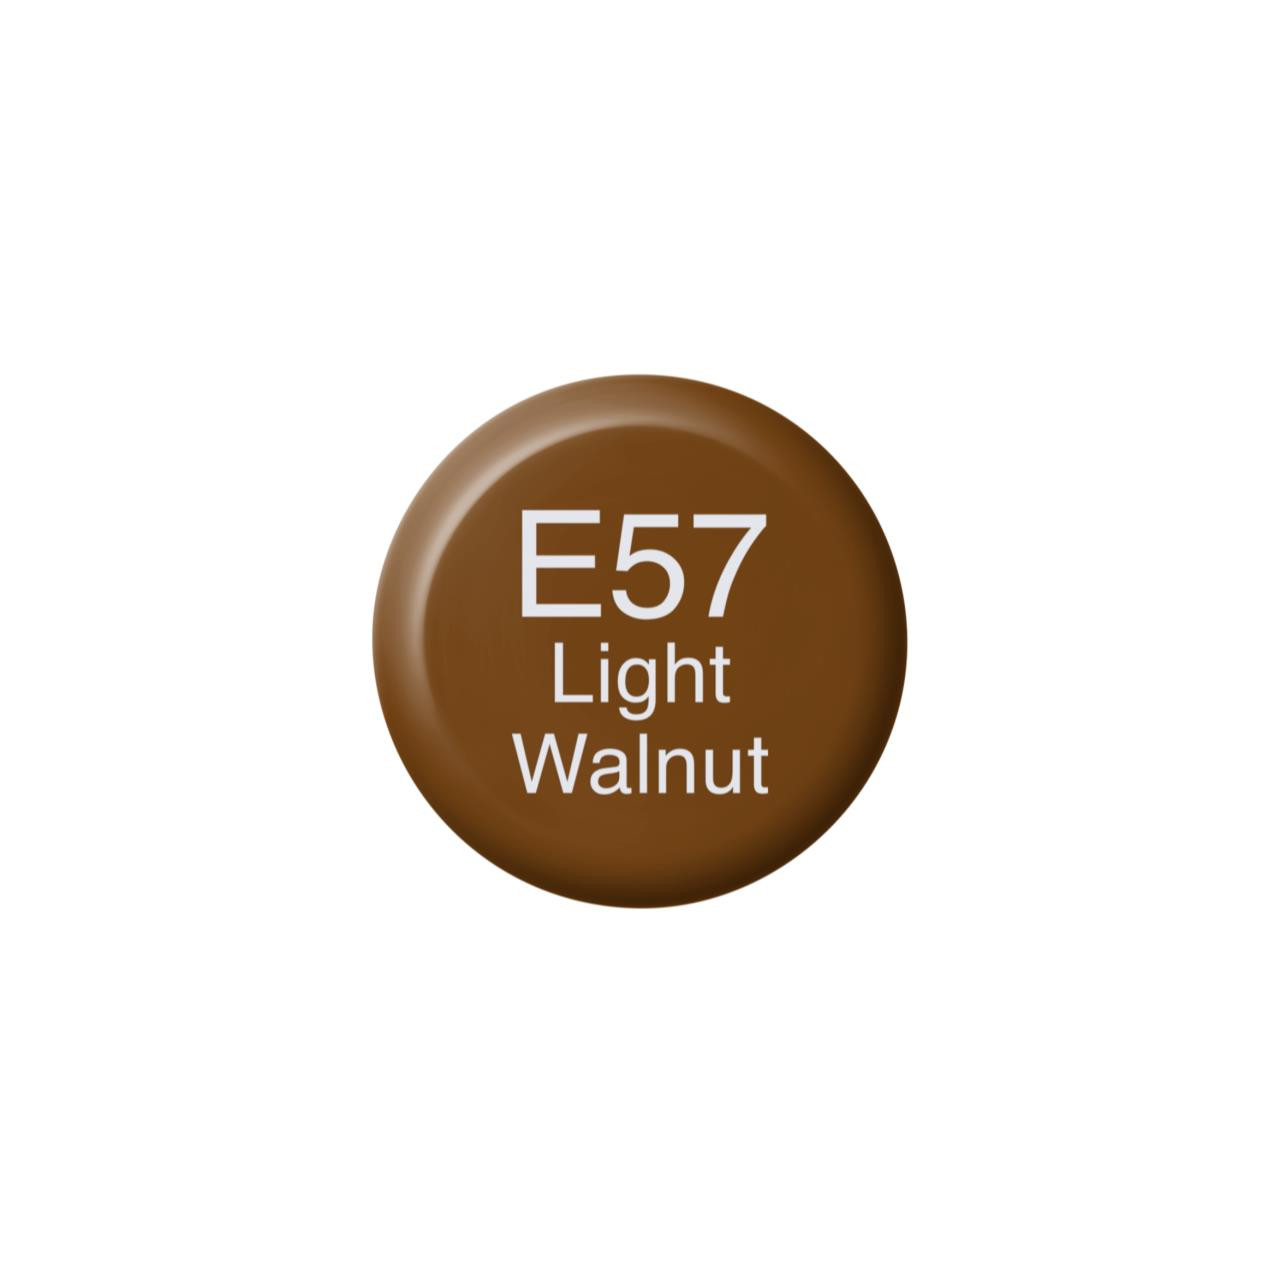 E57 Light Walnut, Copic Ink - 4511338056967